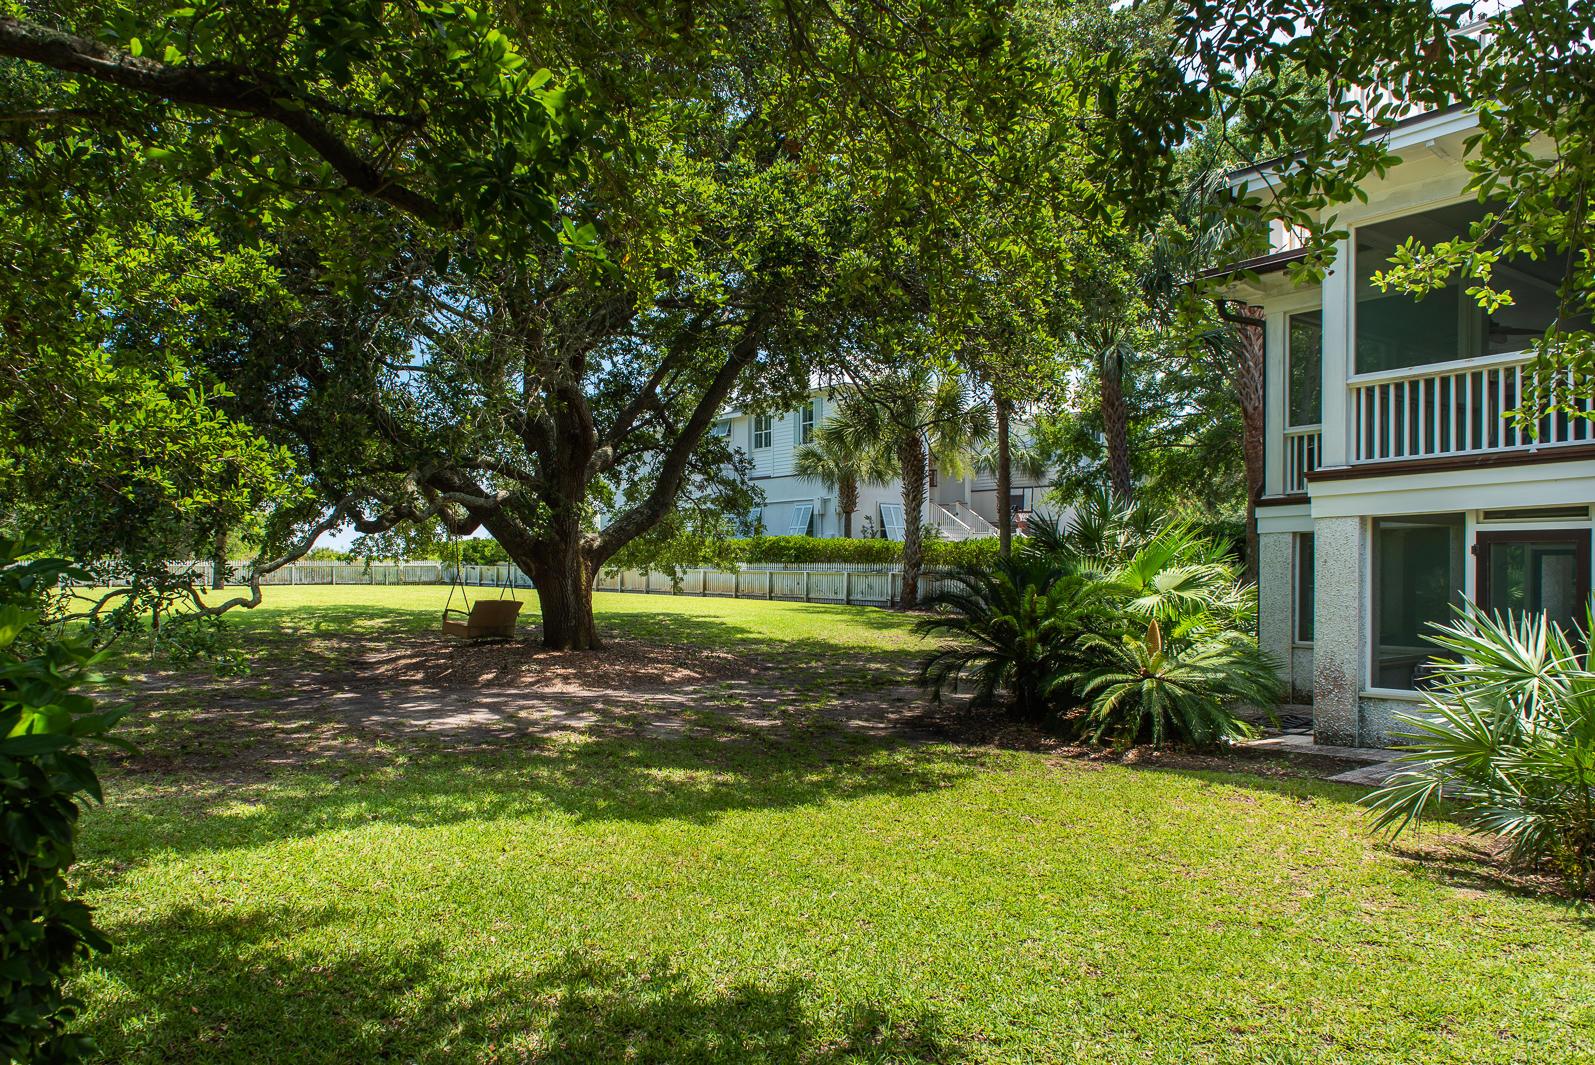 Sullivans Island Homes For Sale - 1773 Atlantic, Sullivans Island, SC - 8